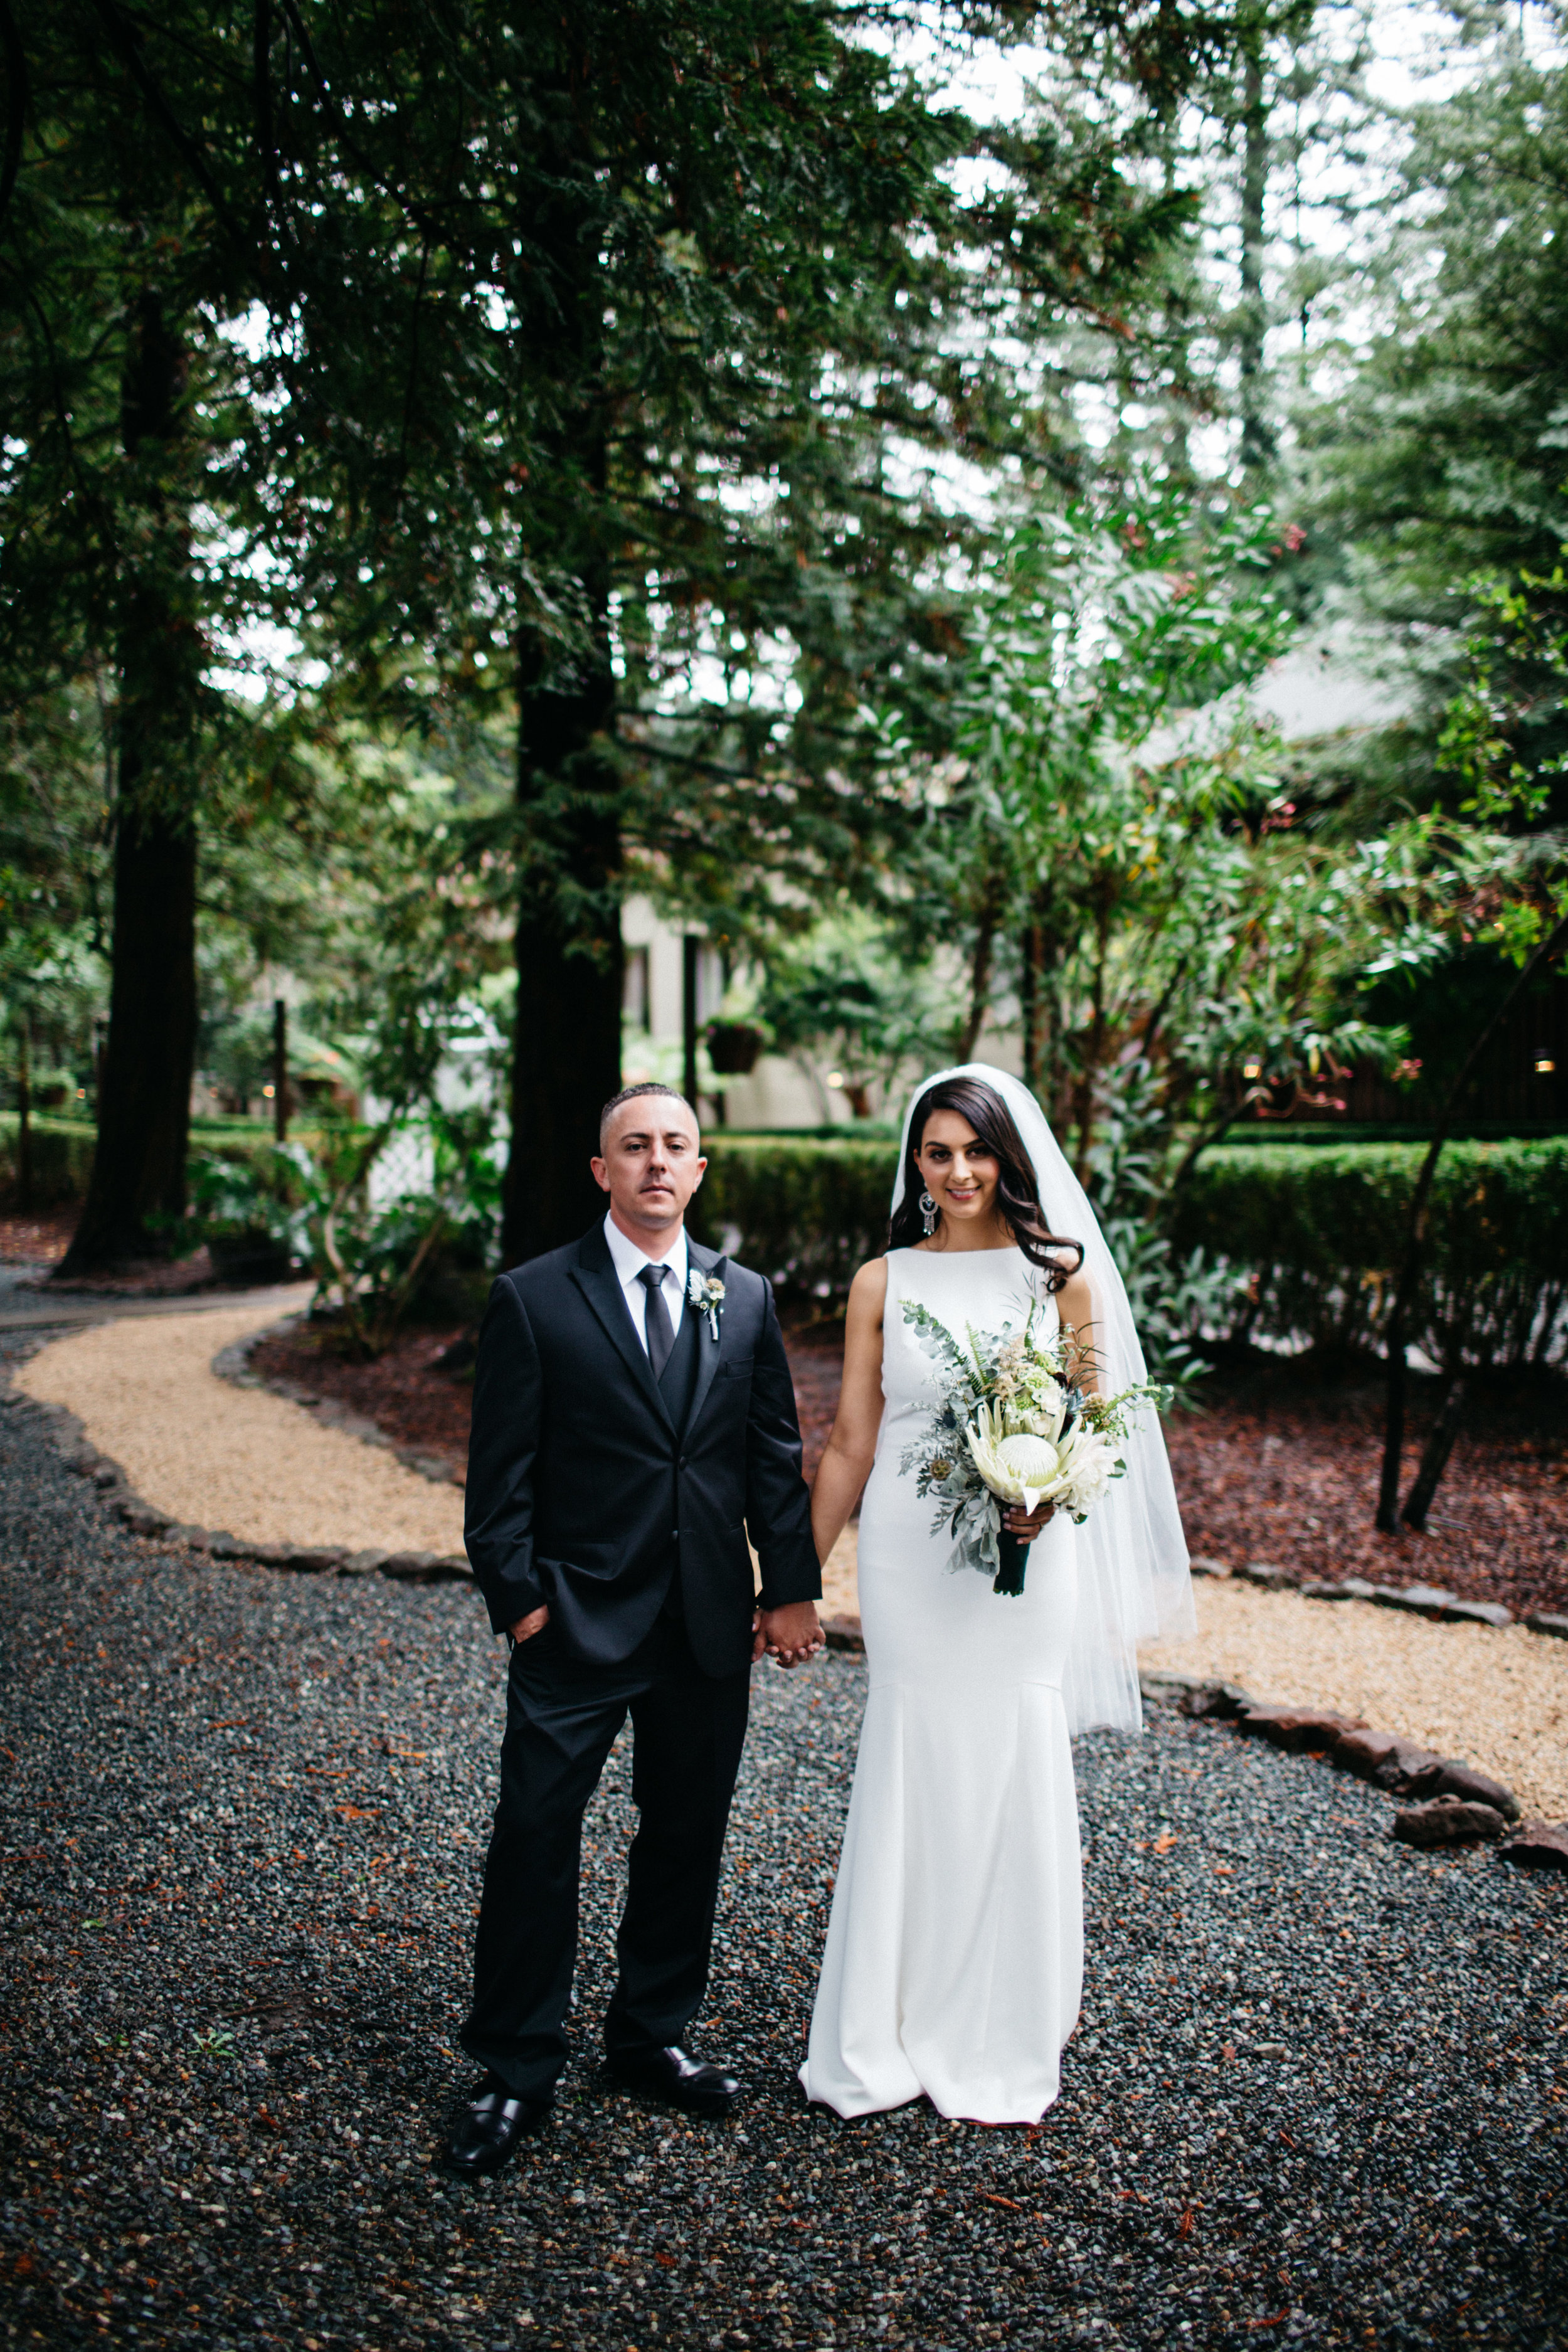 sweet_and_crafty_jocelyn_domingo_wedding_portfolio_033.jpg